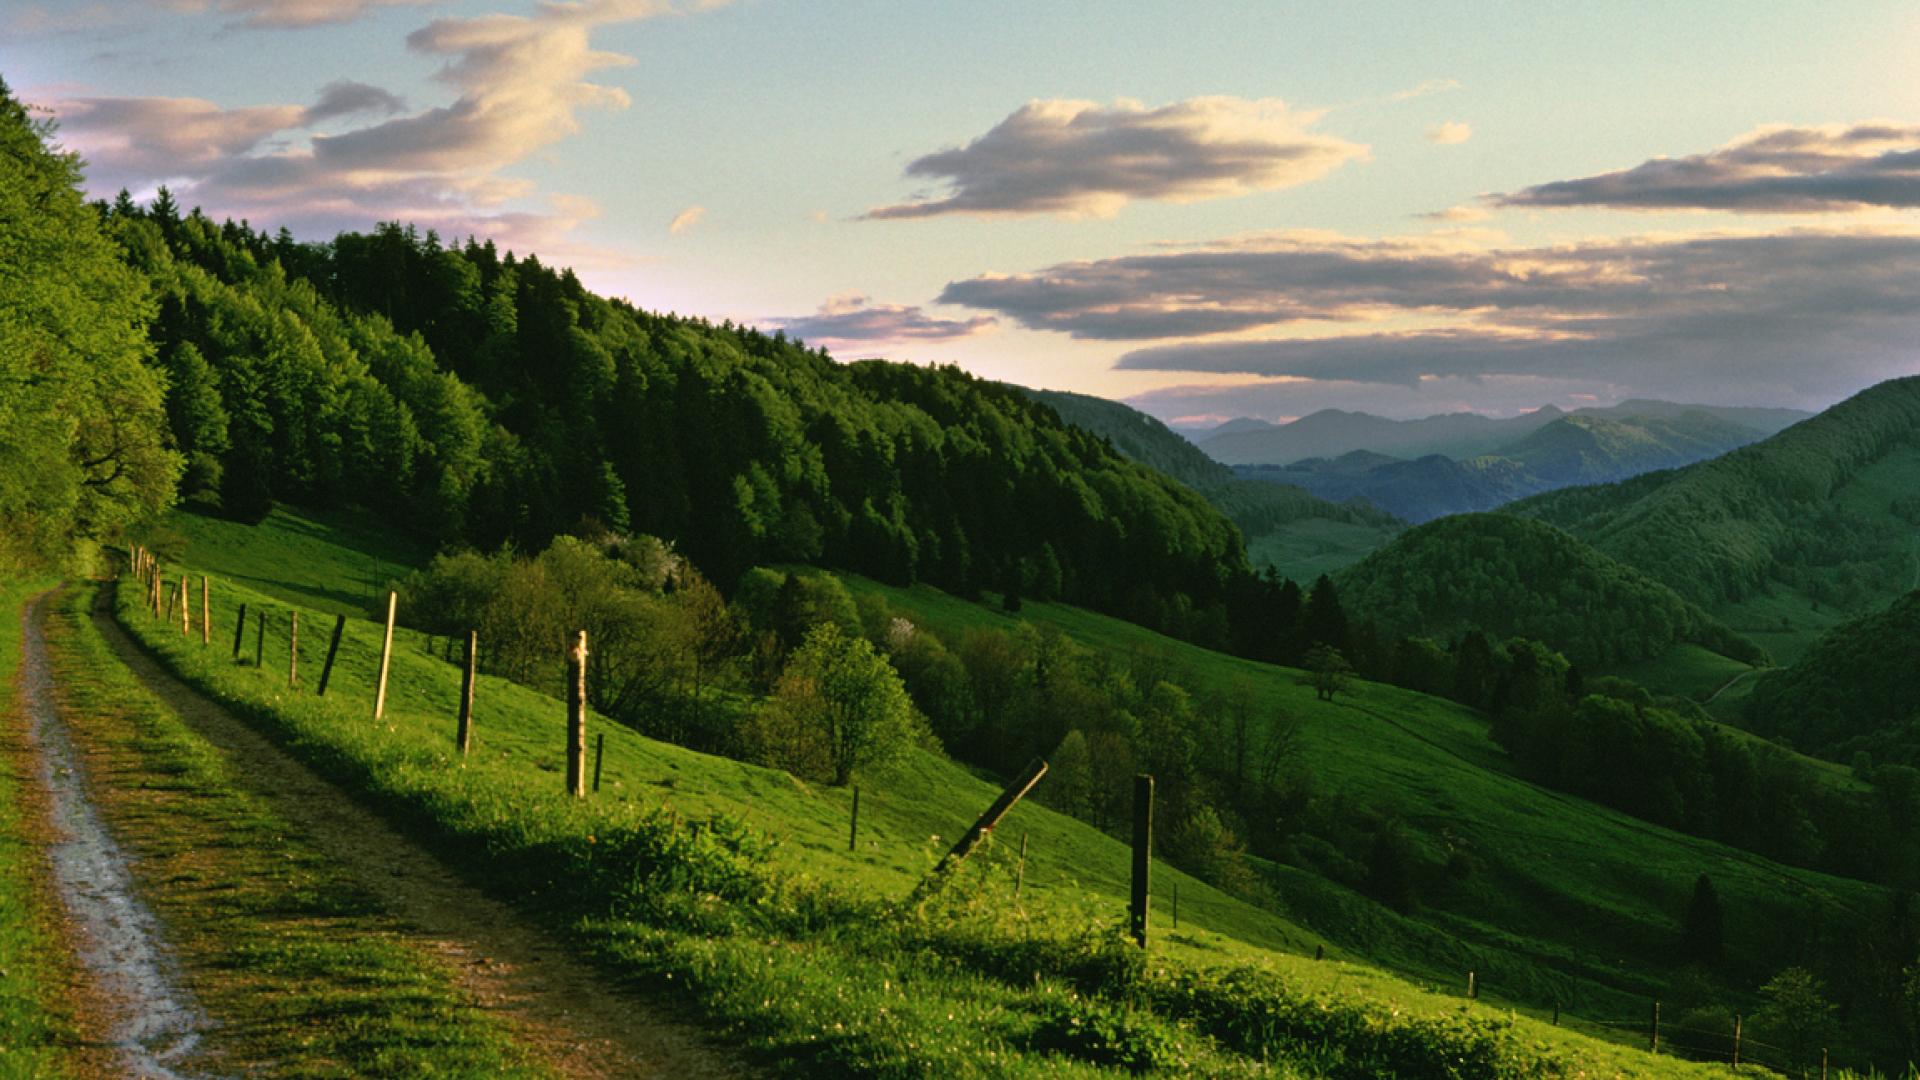 Baselland Aussichten Ausflugsziele 5